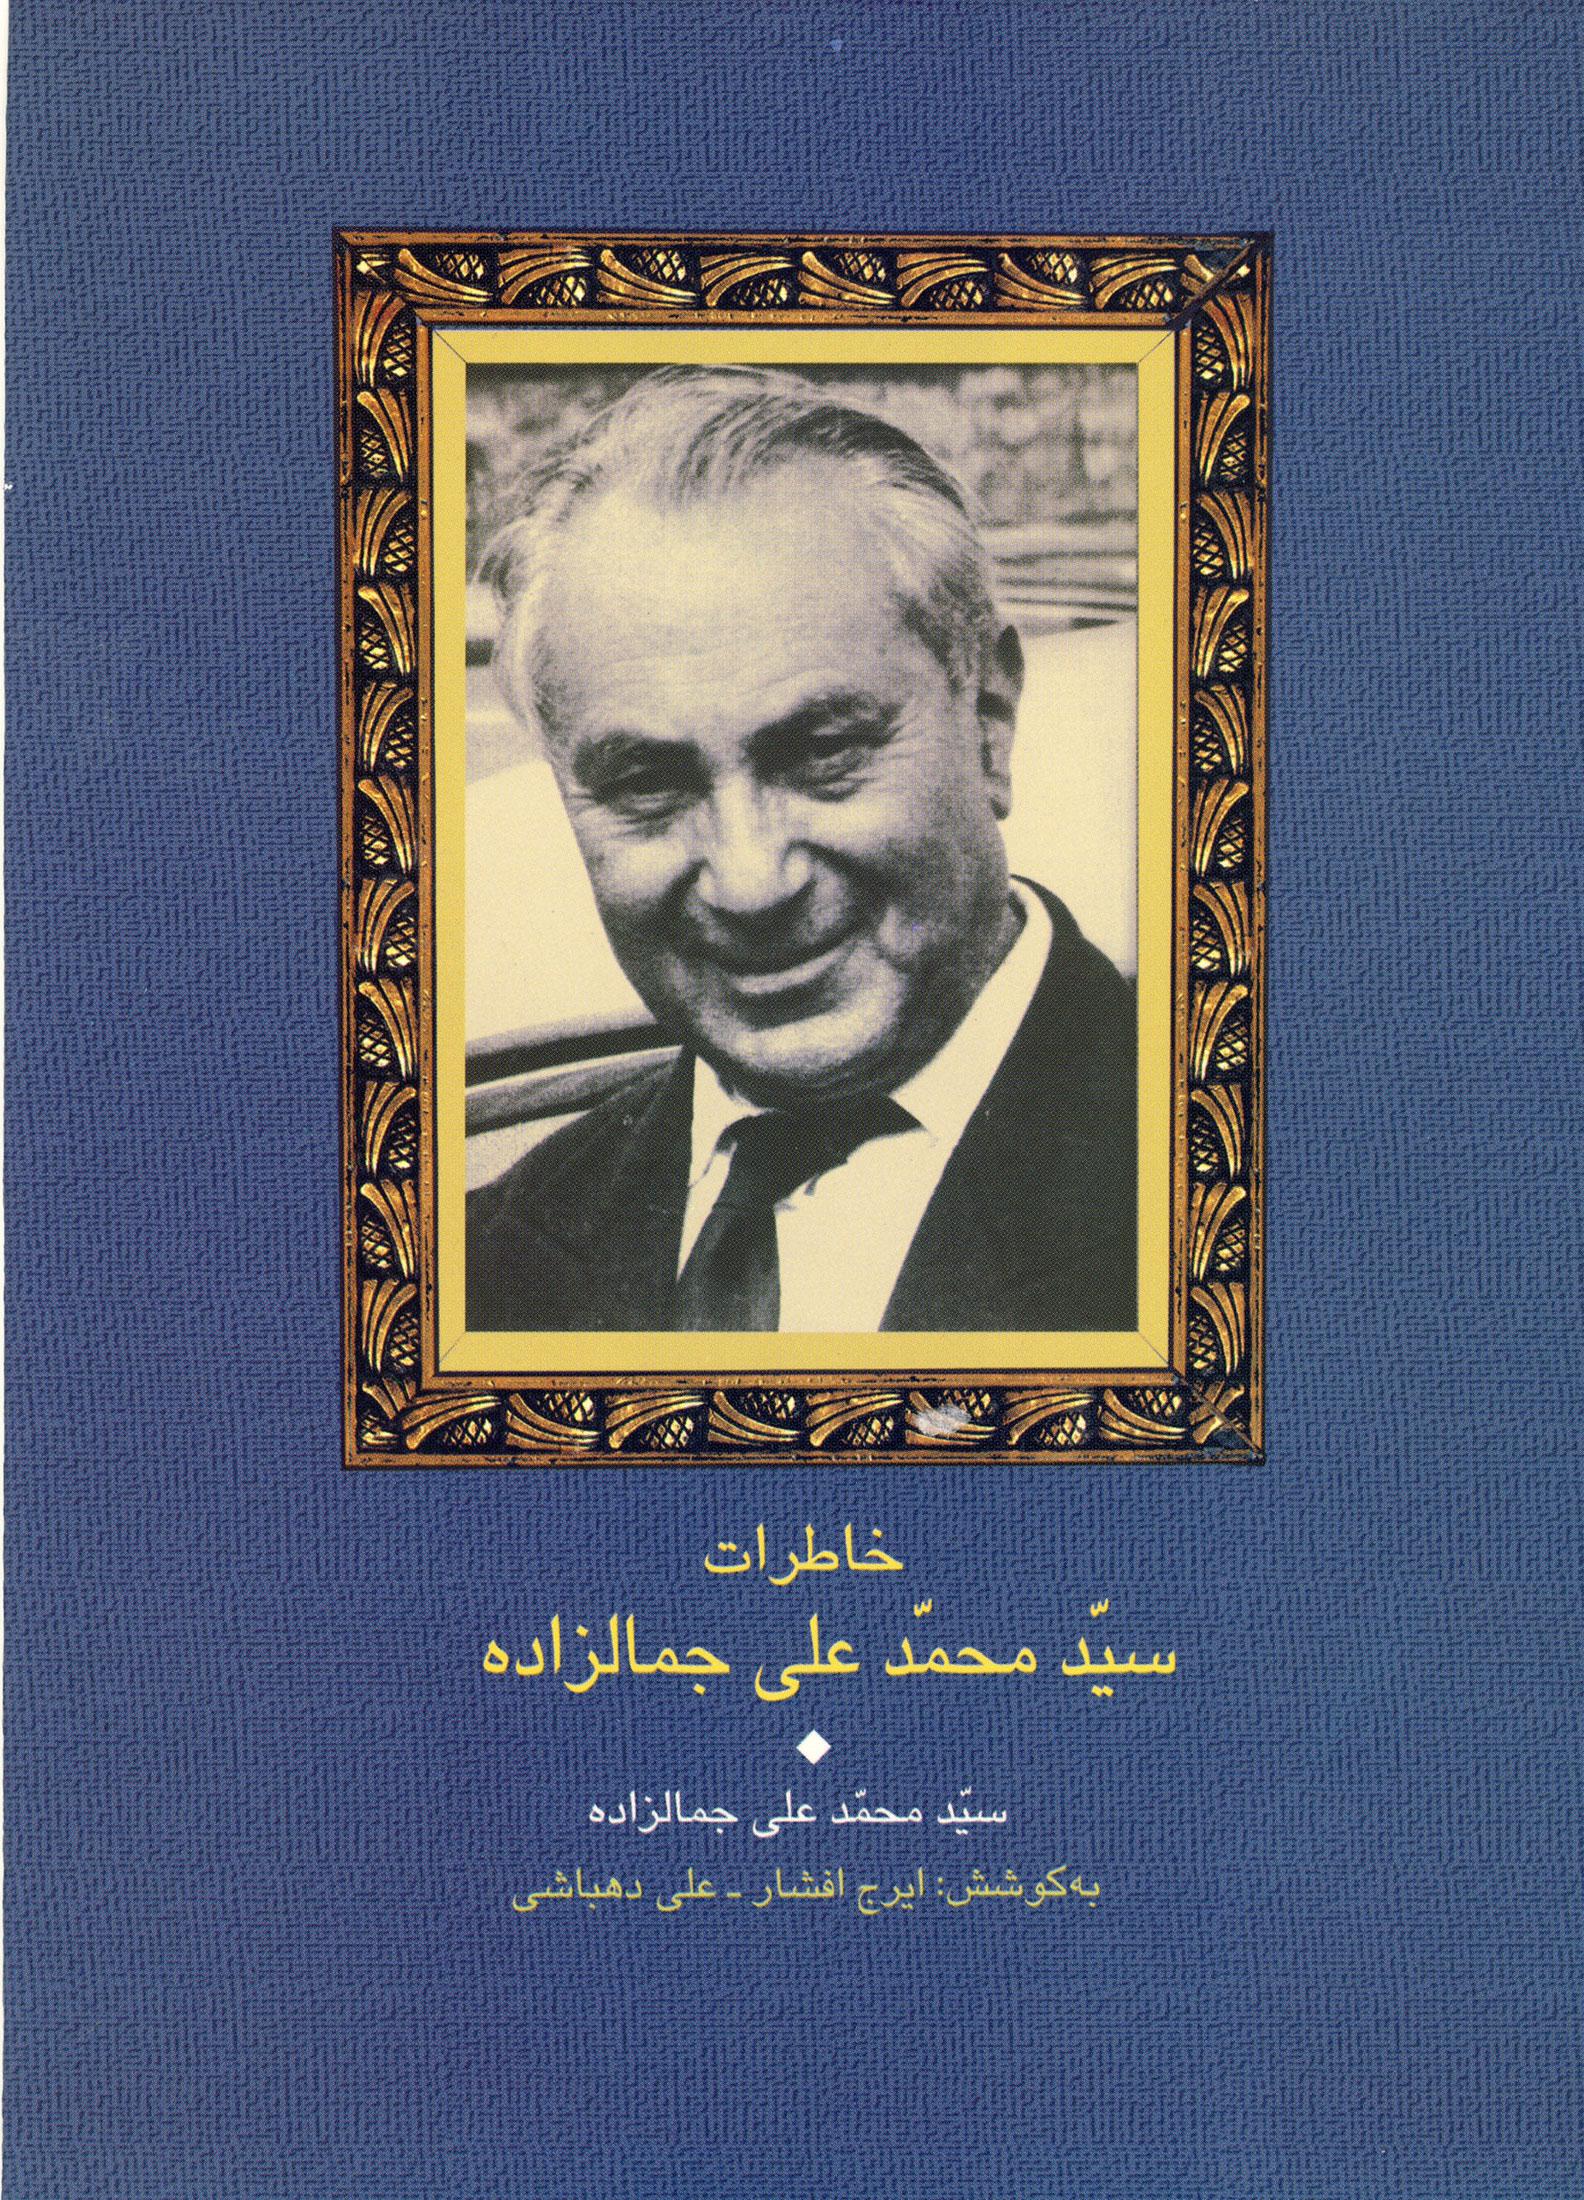 Jamalzadeh-(3)